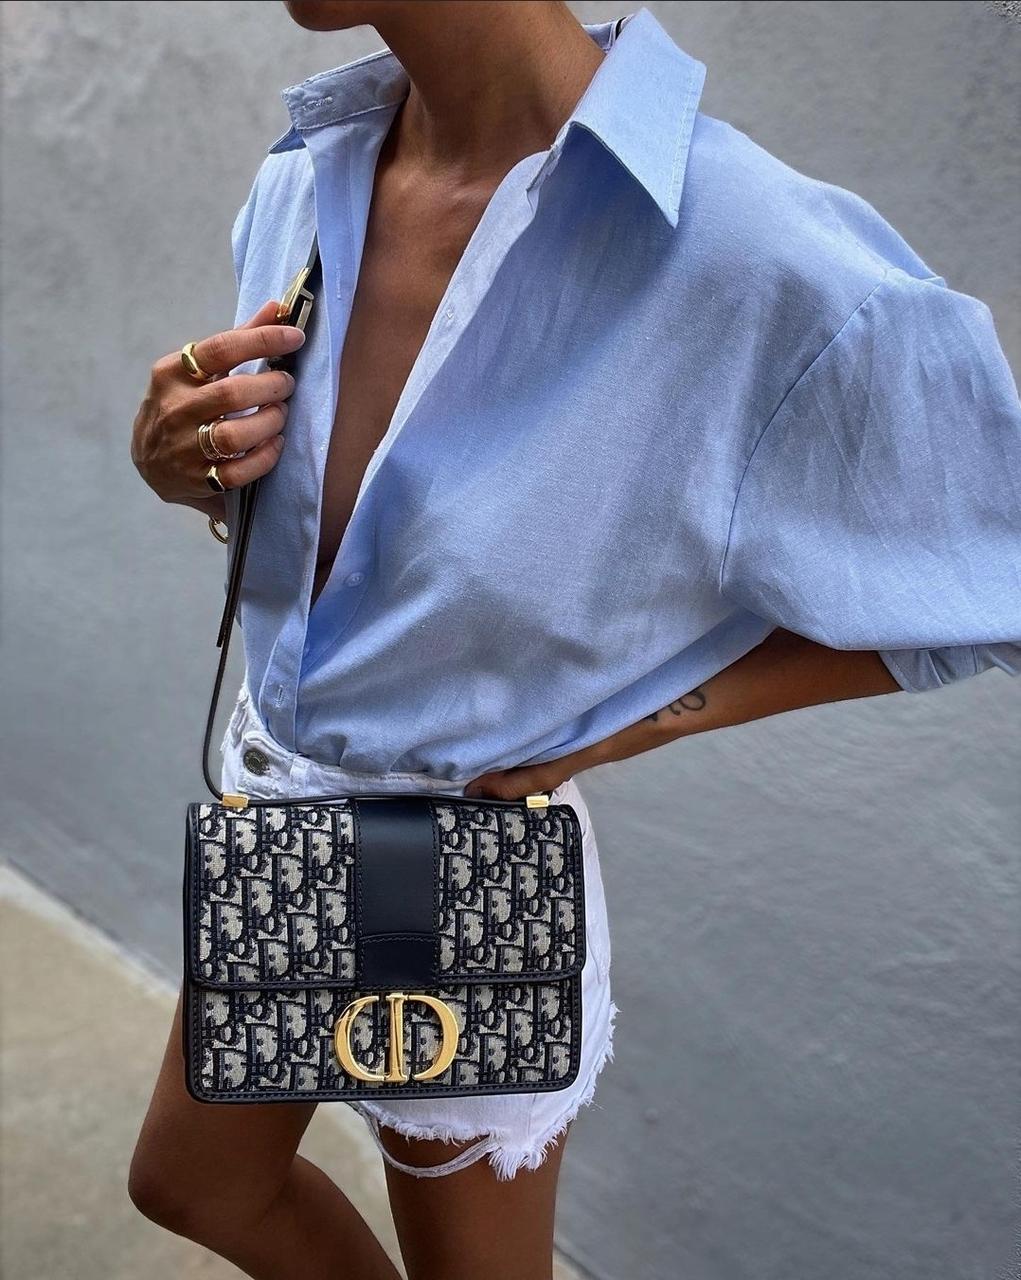 blogger, denim shorts, and dior image